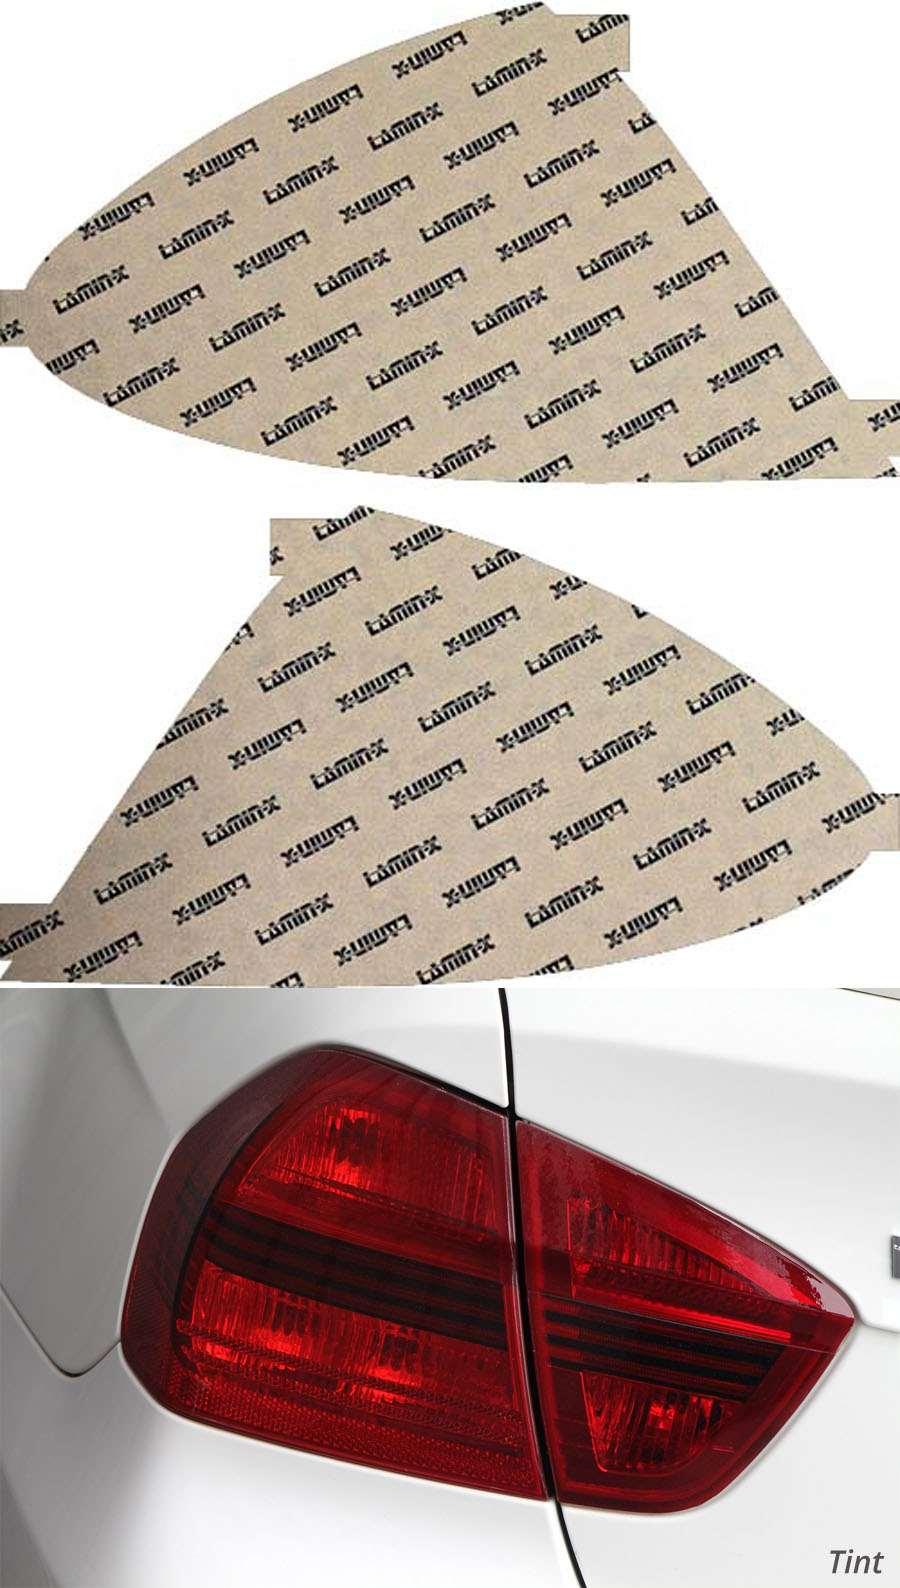 Mercedes E-Class 07-09 Tint Tail Light Covers Lamin-X MB220T